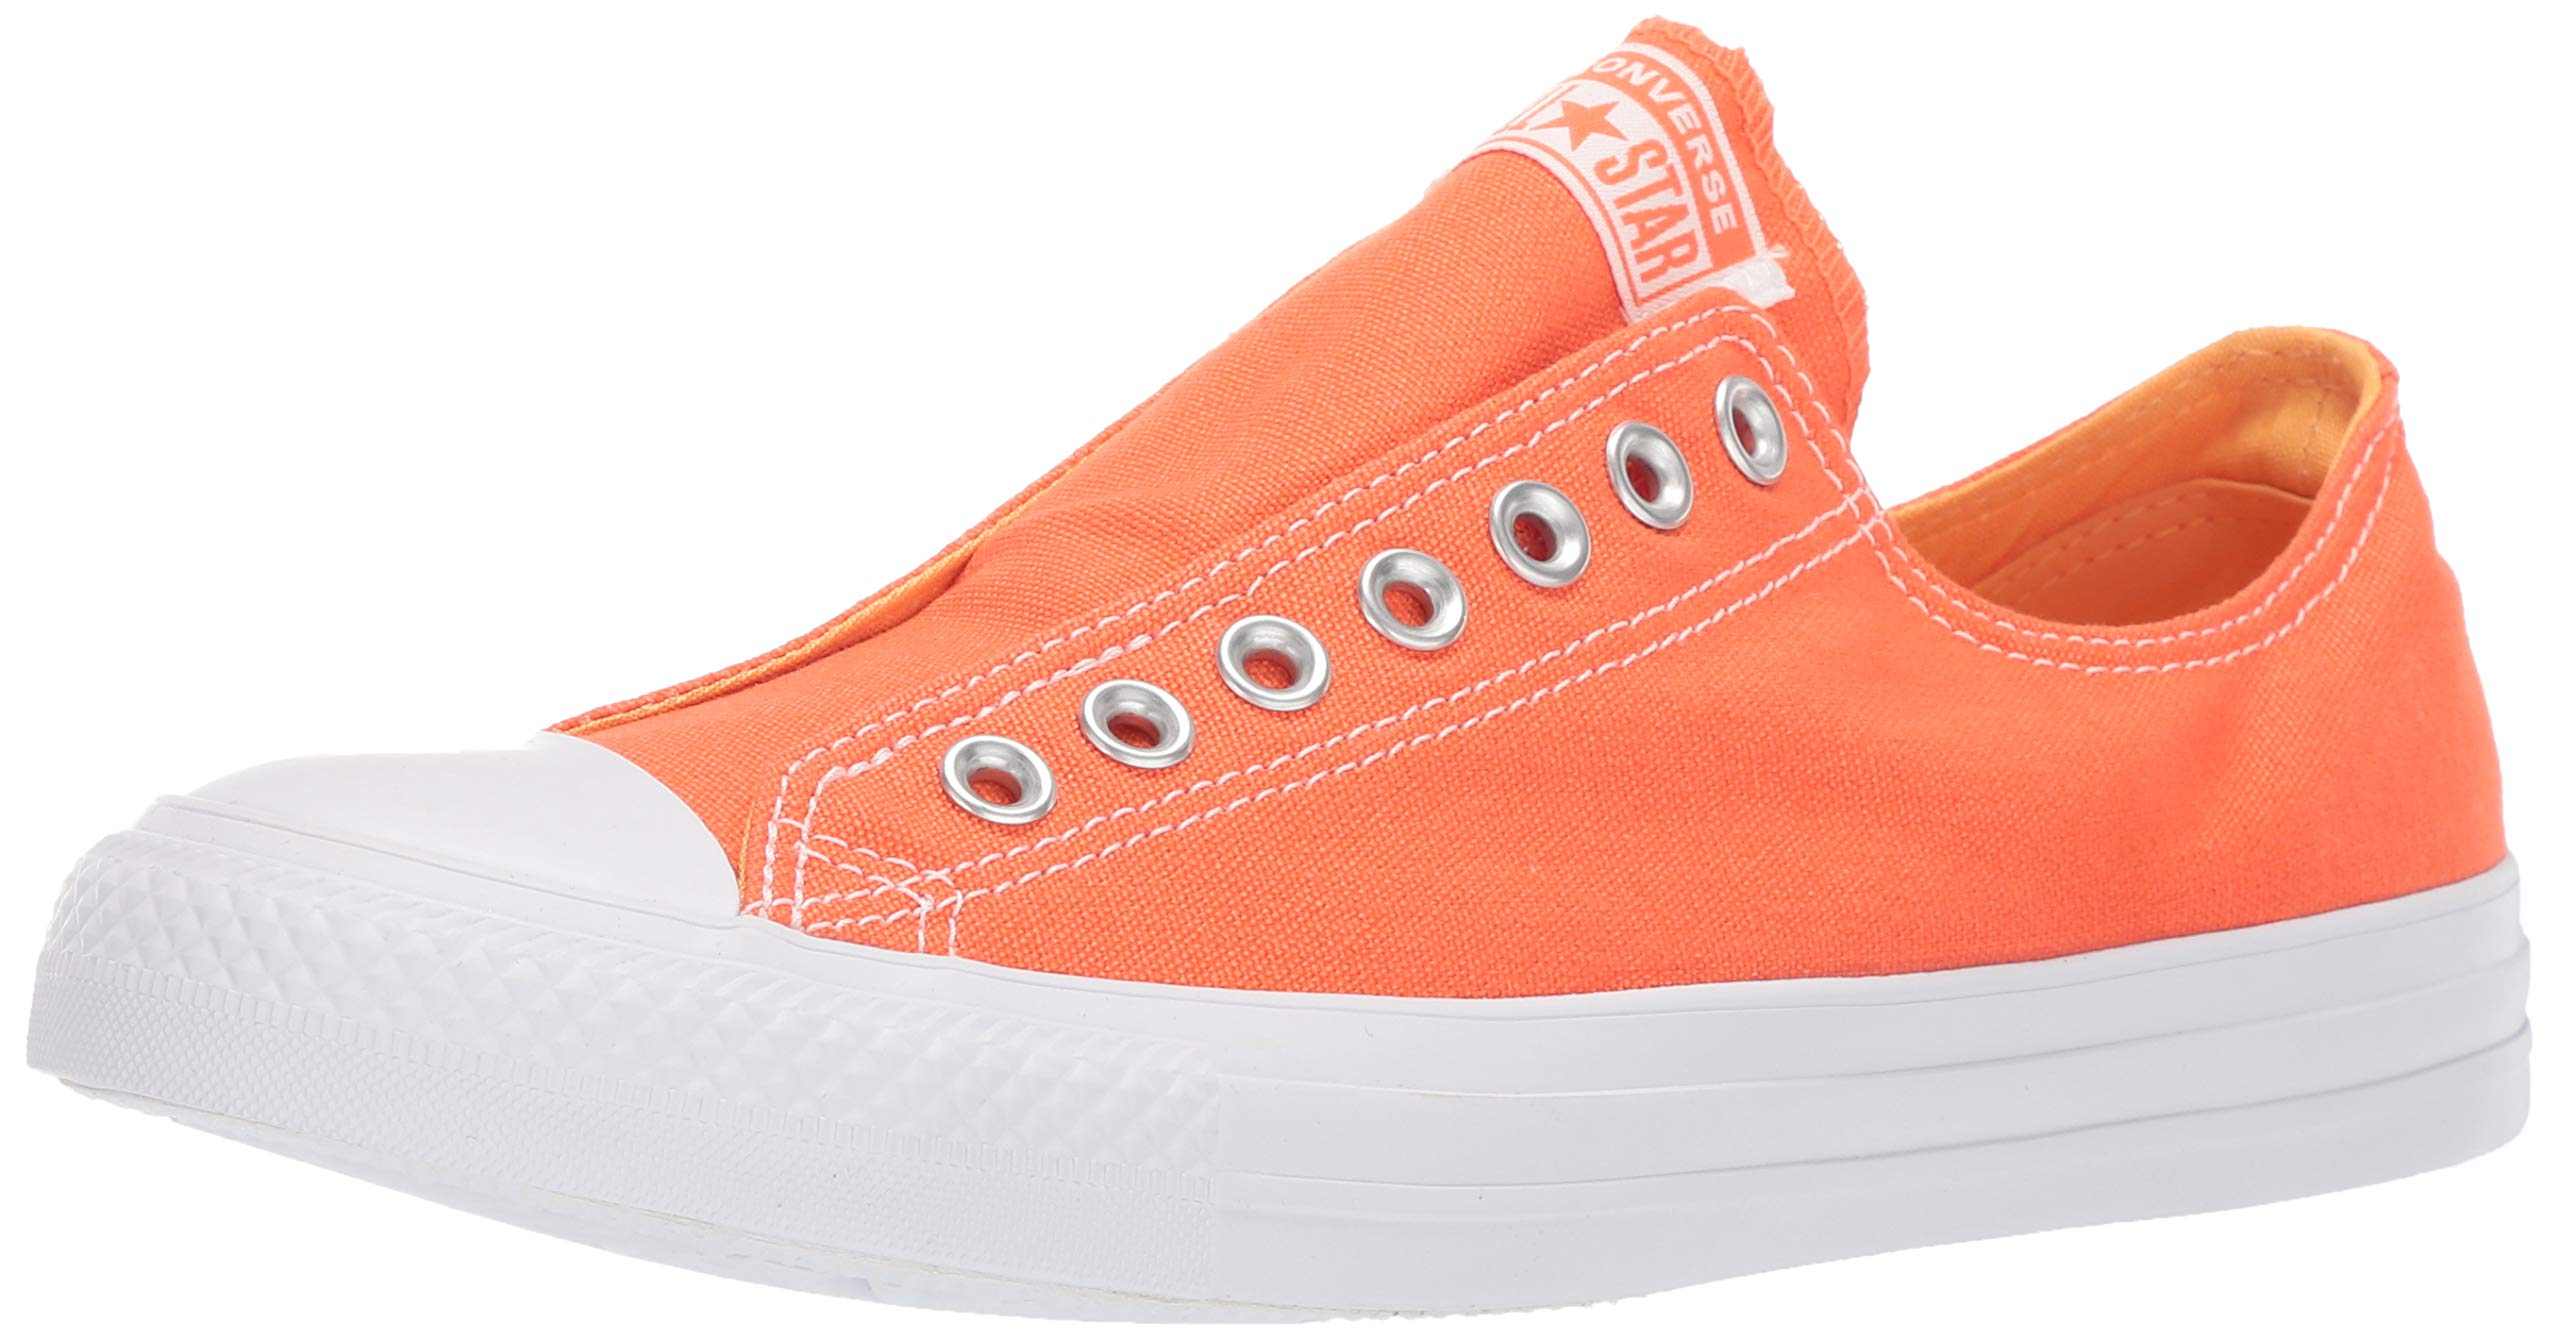 Converse Unisex Chuck Taylor All Star Slip On Sneaker, Turf OrangeMelon BallerWhite, 3.5 Men'sWomen's 5.5